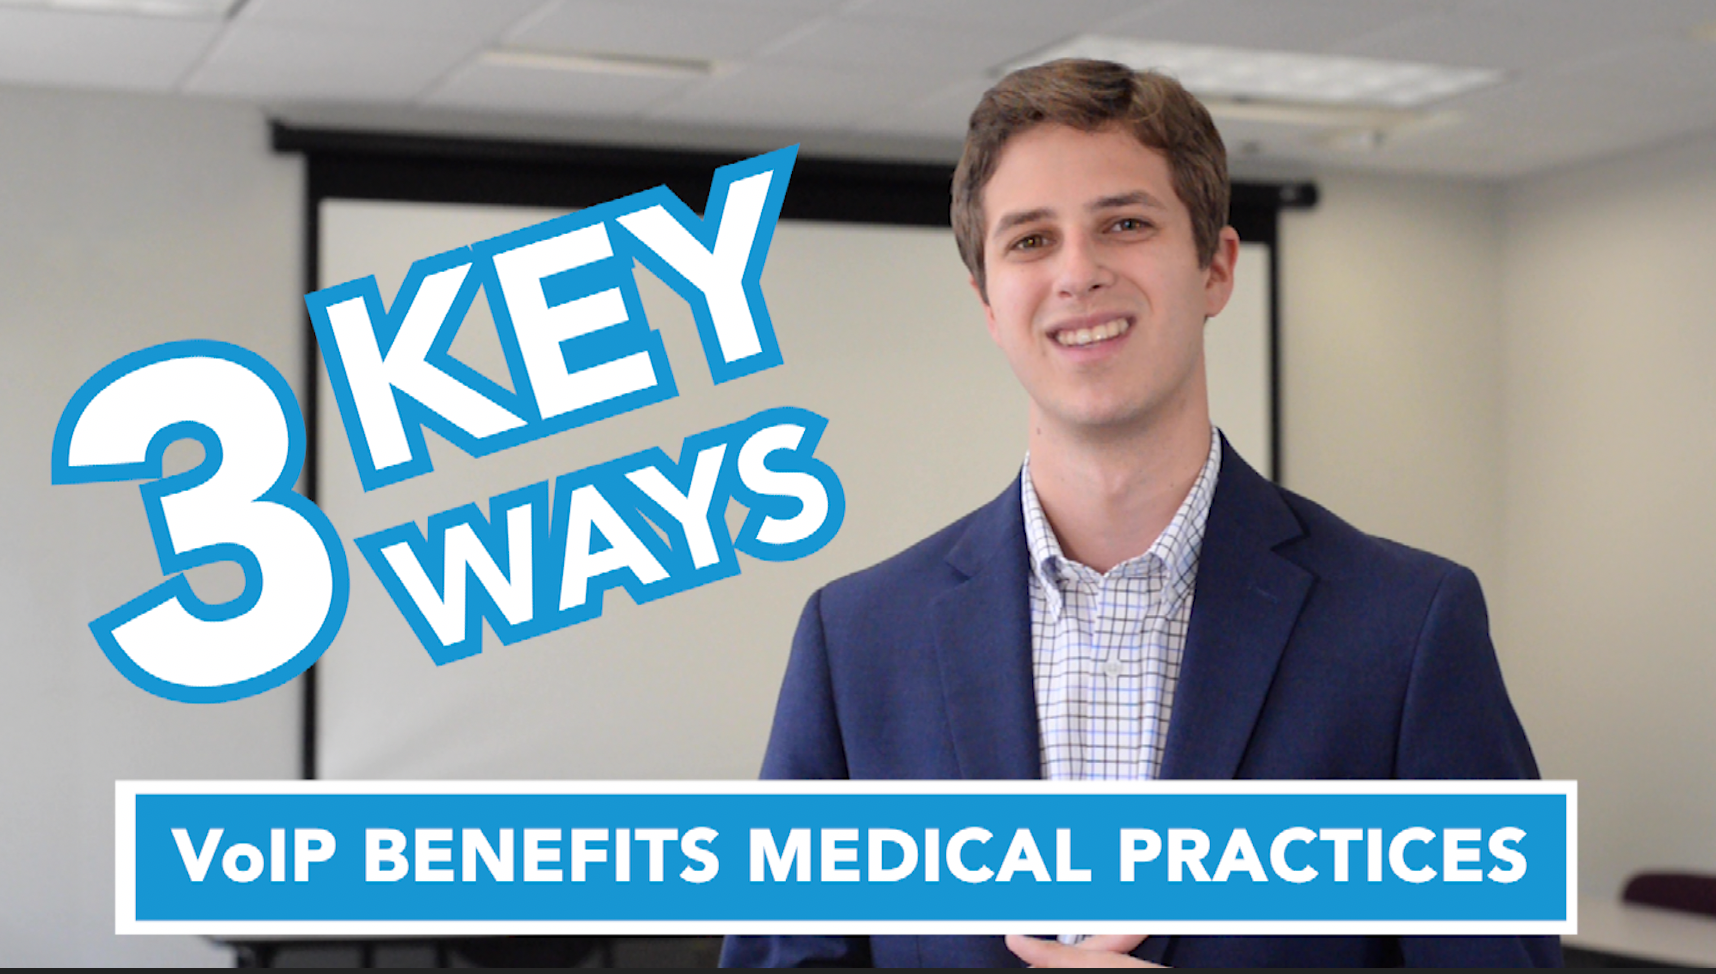 Three Key Ways VoIP Benefits Medical Practices